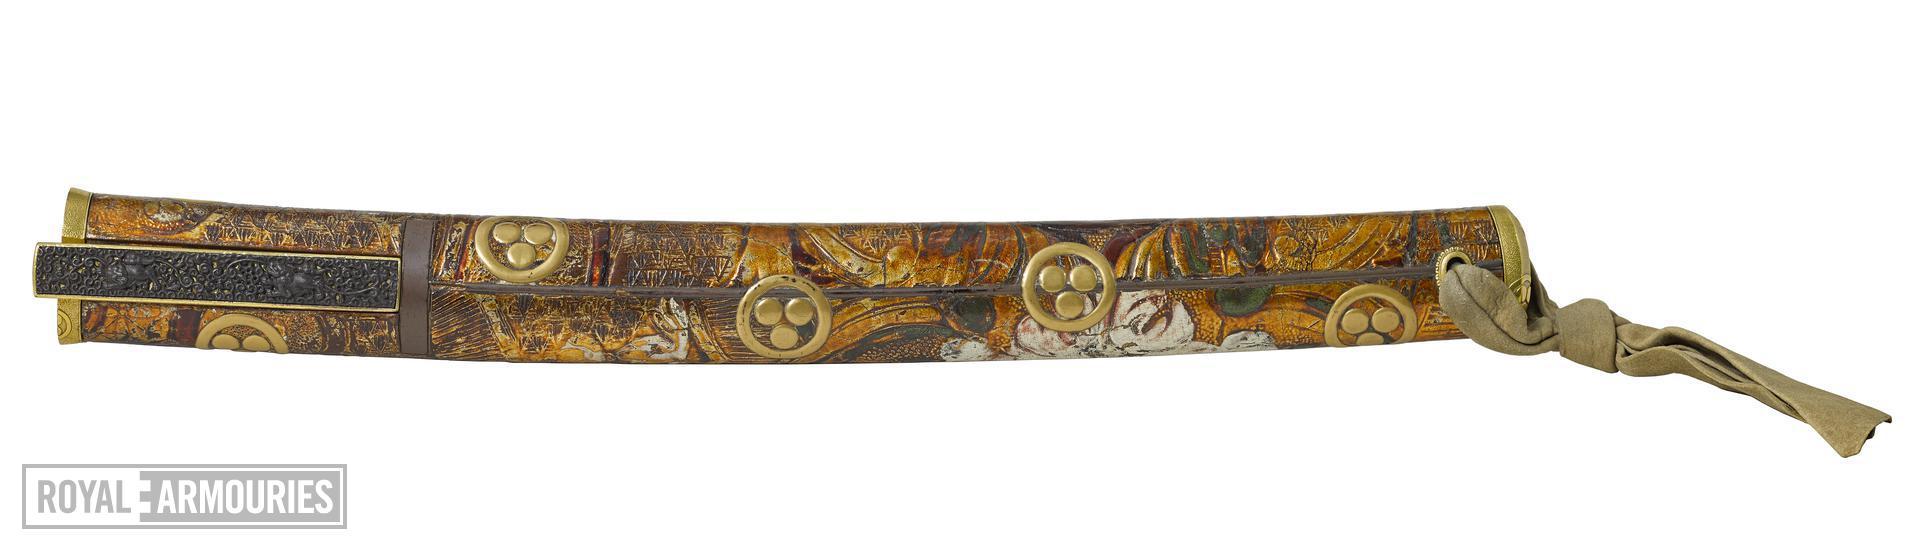 Dagger (aikuchi) with German blade dated 1625